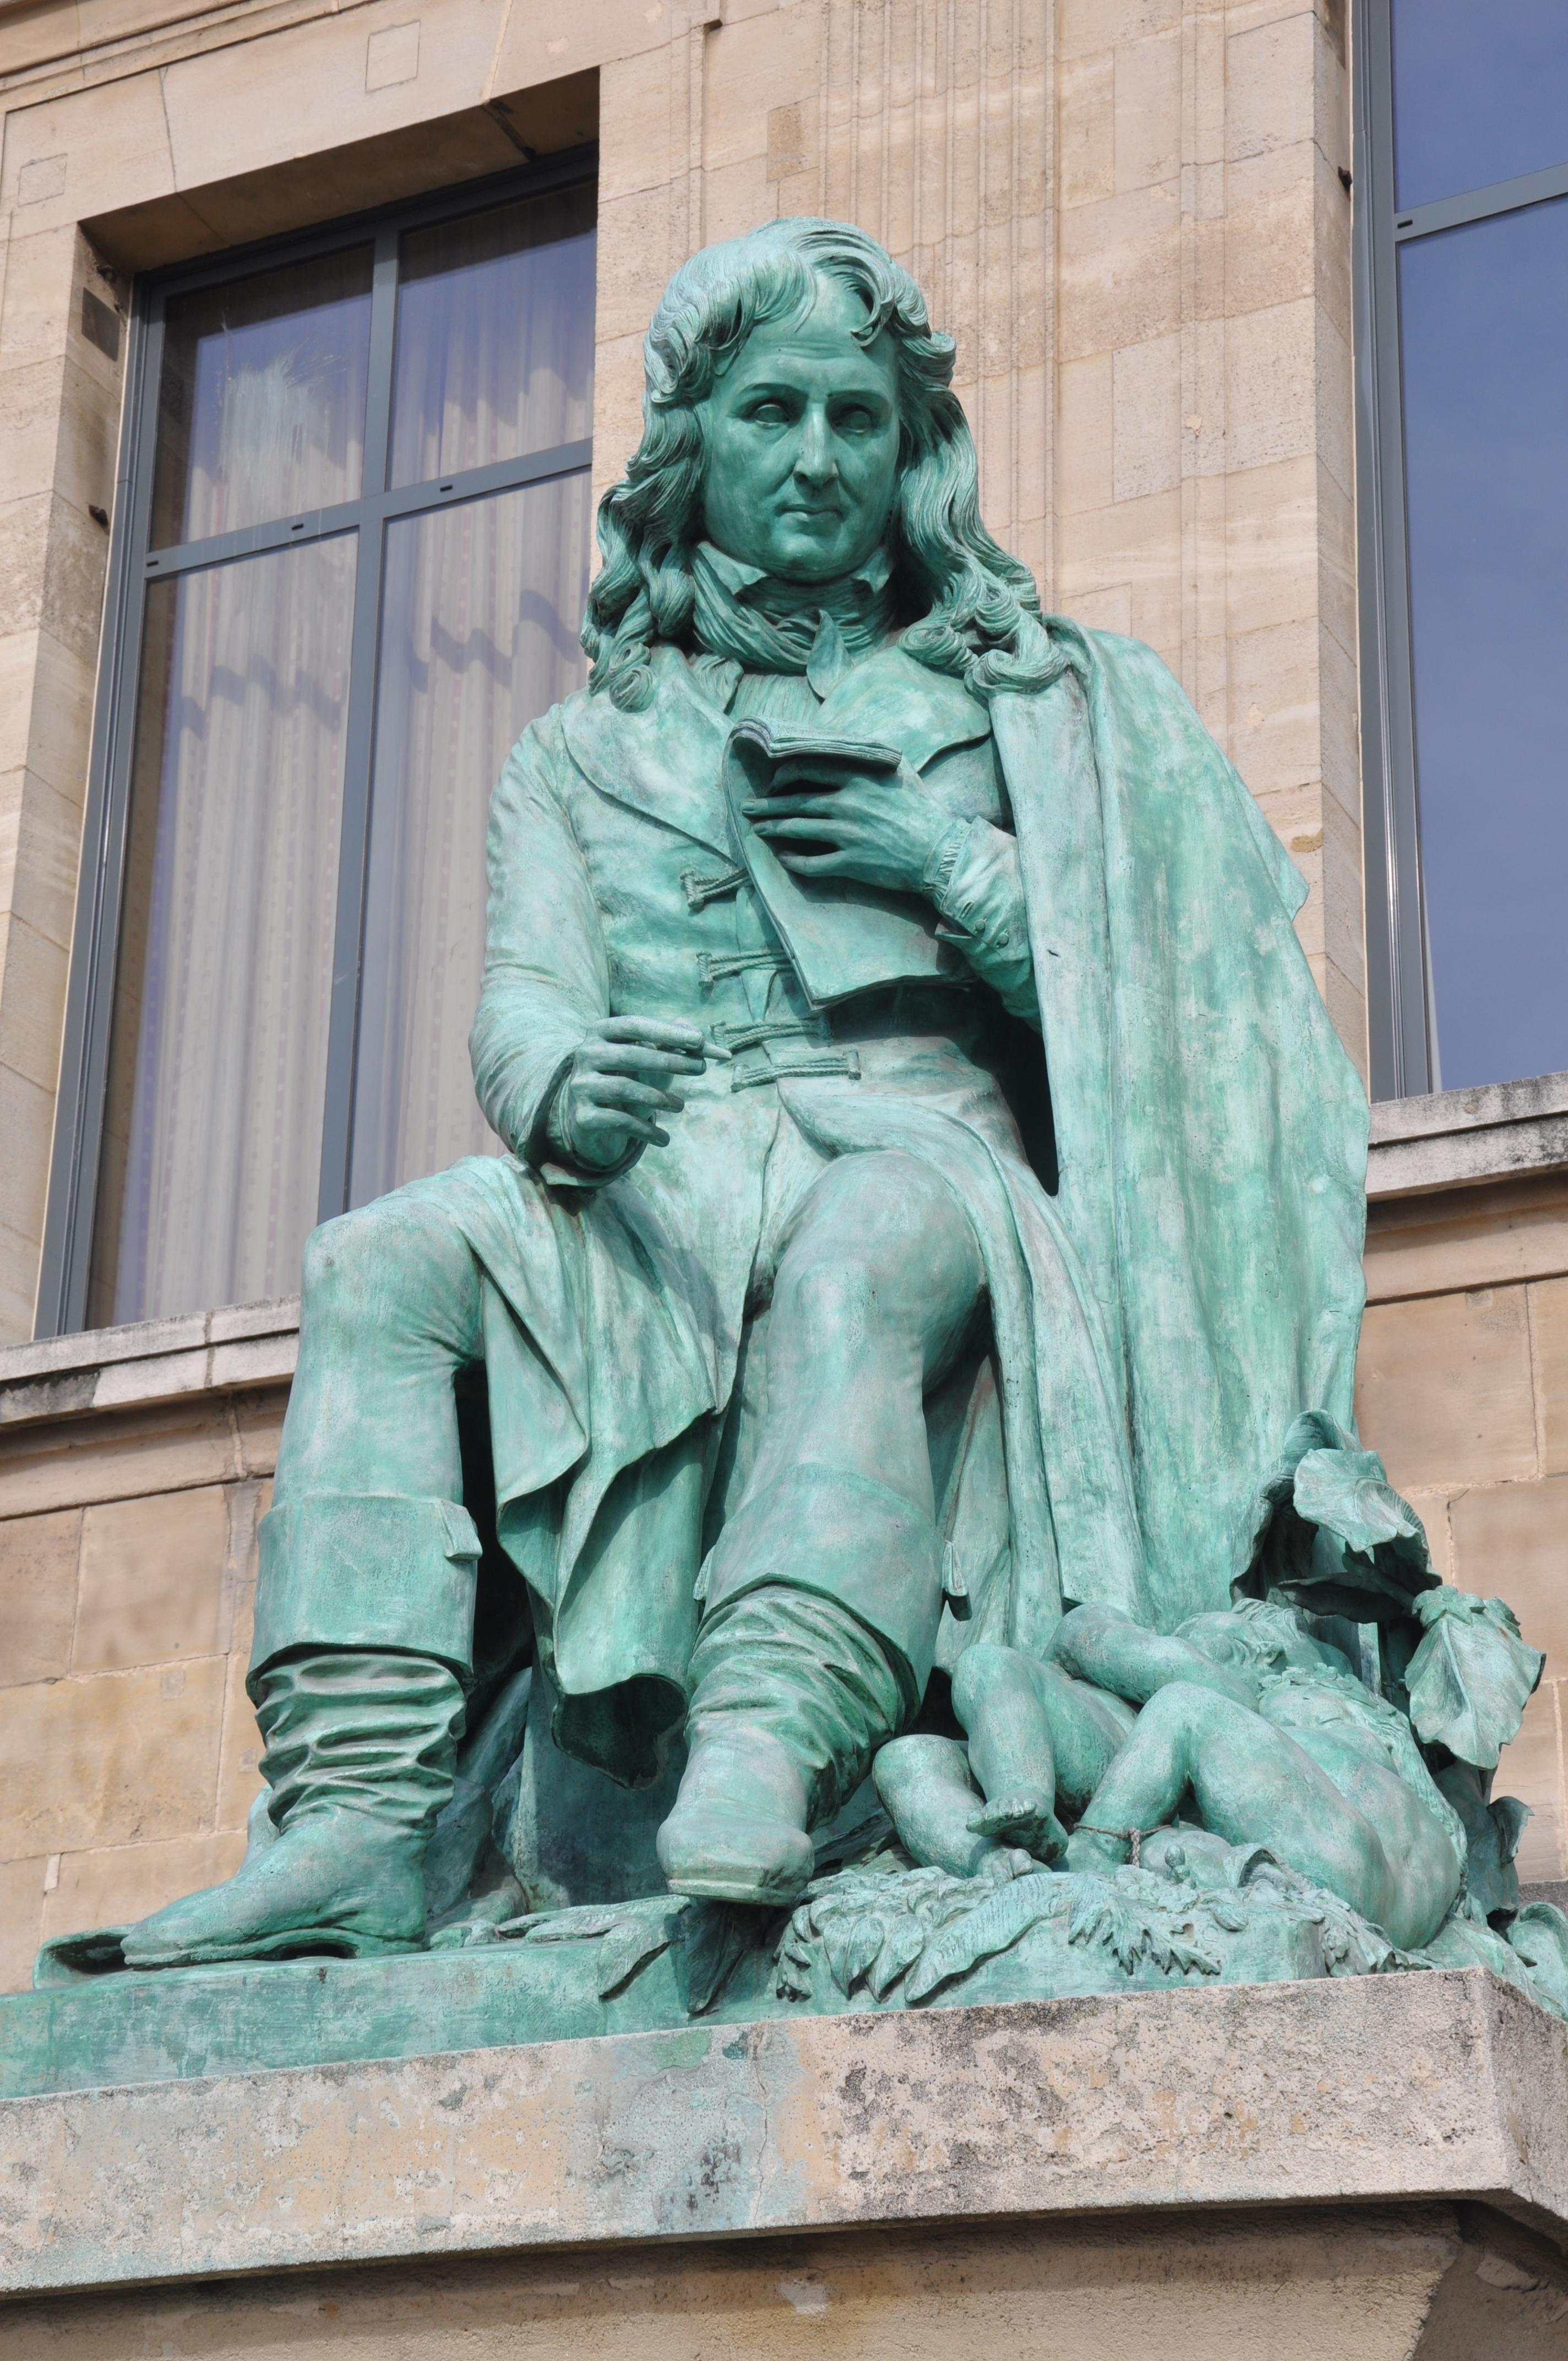 Fichier:Bernardin de Saint-Pierre statue Le Havre.jpg — Wikipédia